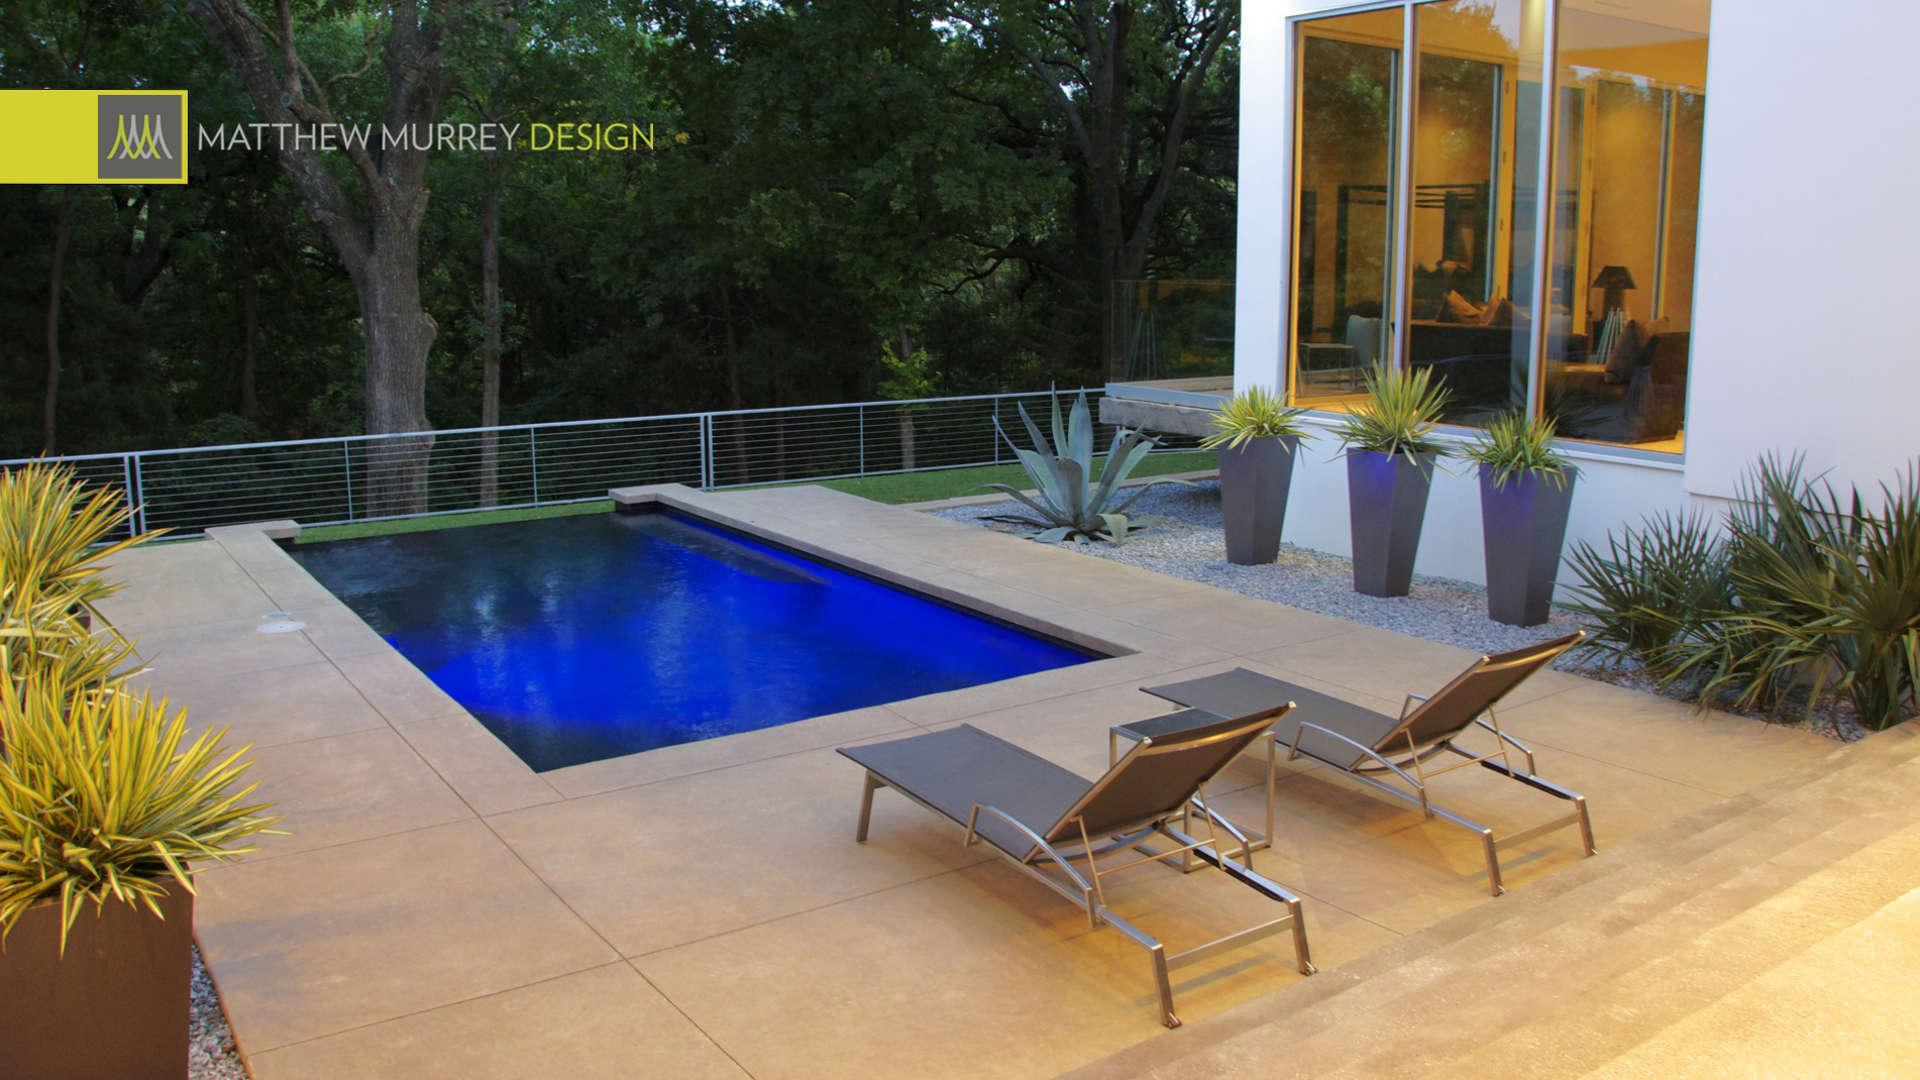 dallas landscape design firm matthew